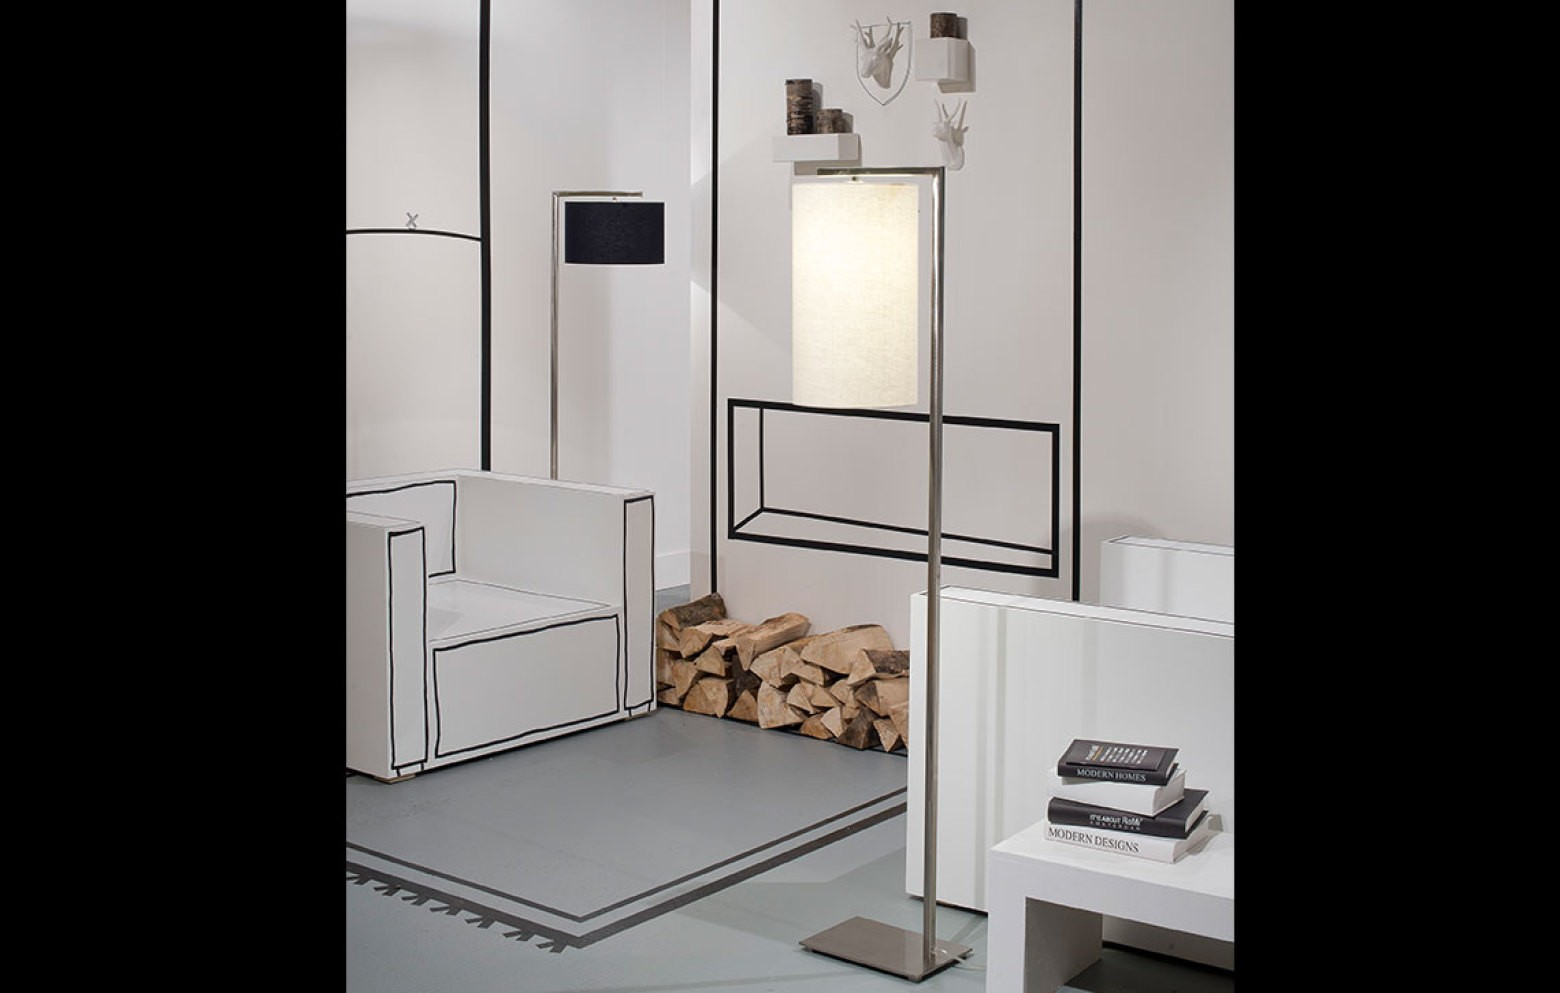 stehlampe boston g nstig bei who 39 s perfect kaufen. Black Bedroom Furniture Sets. Home Design Ideas